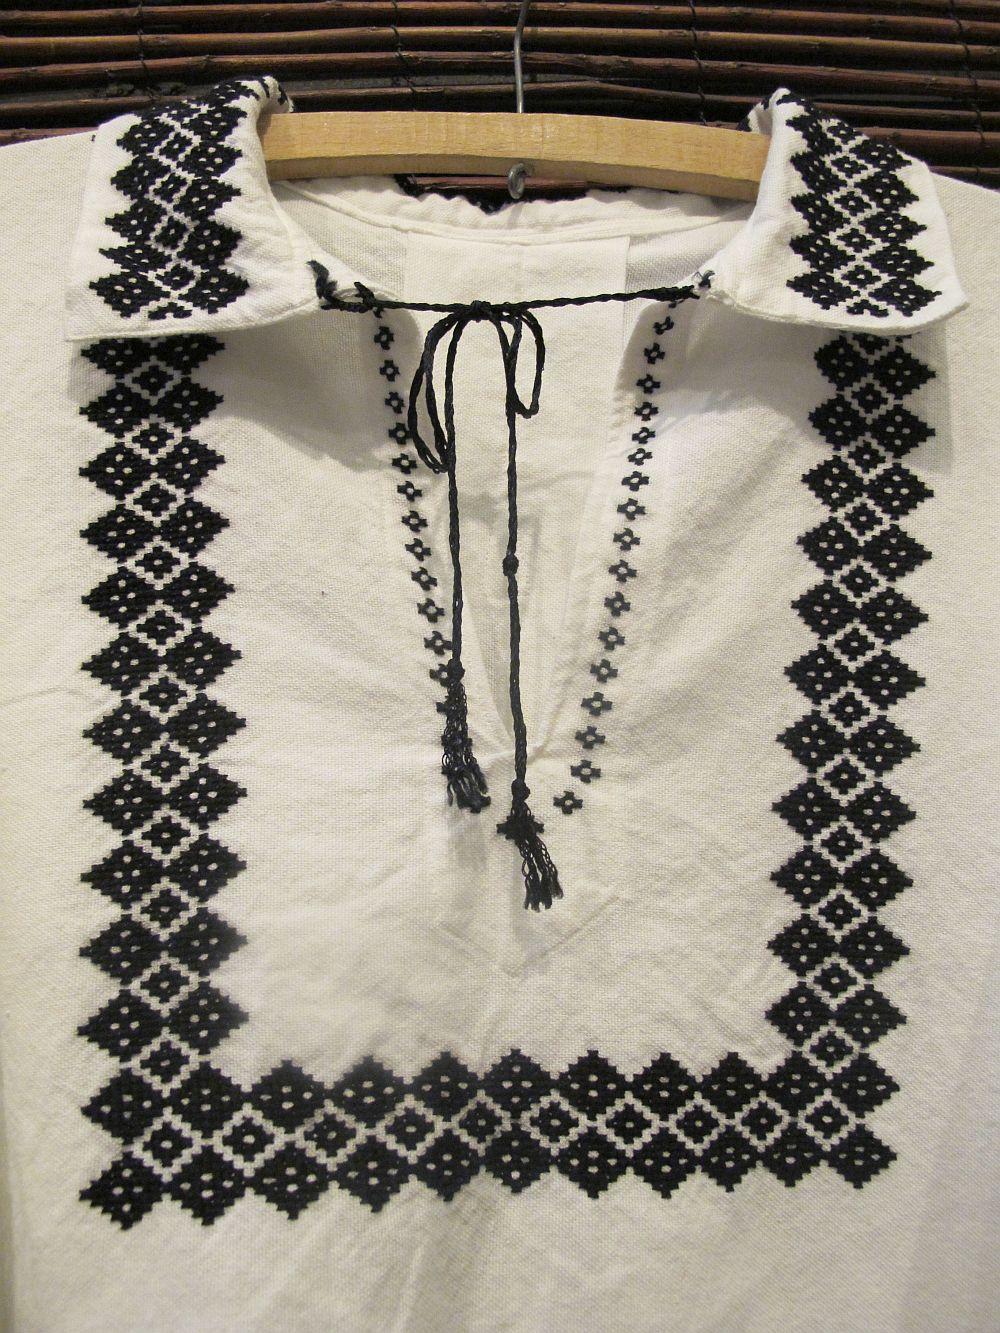 adelaparvu.com about Doina Nistor dolls artisan (6)